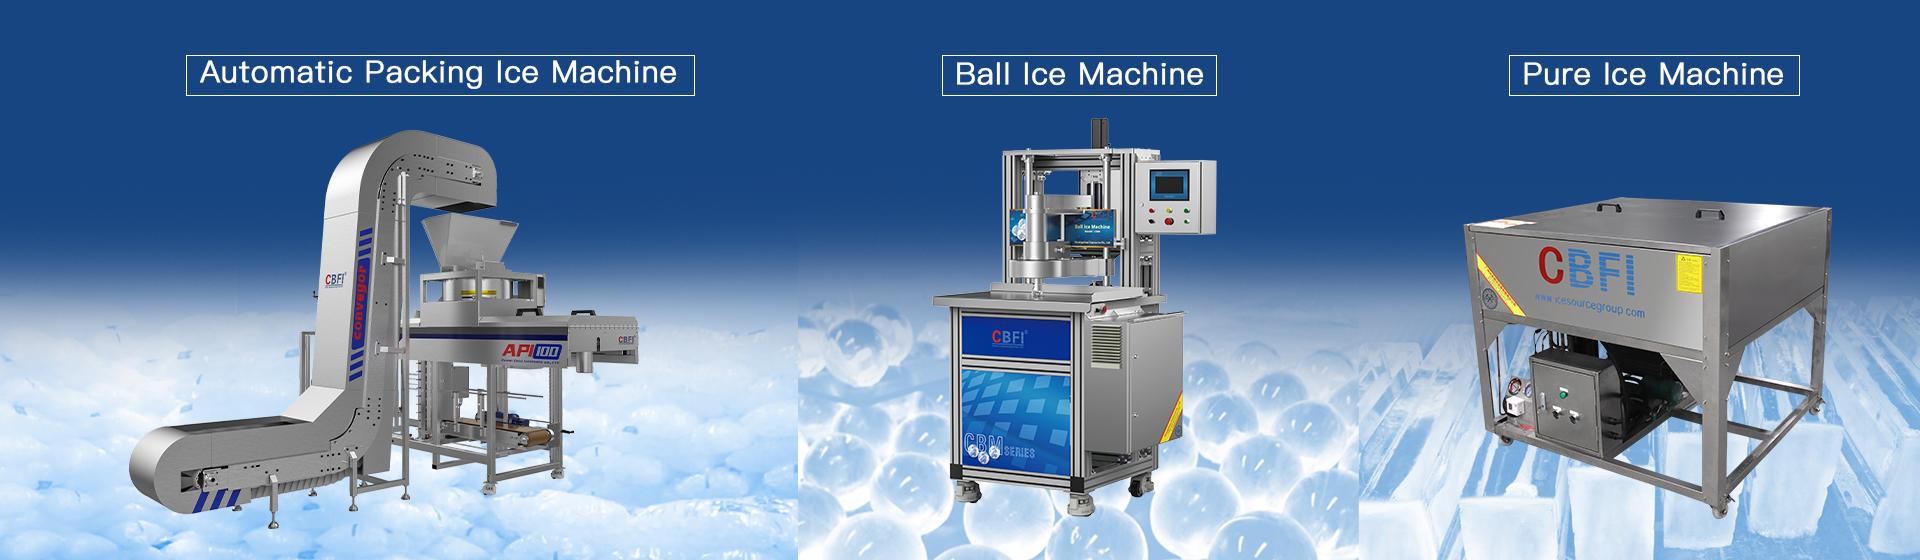 category-ice packing machine-CBFI-img-5